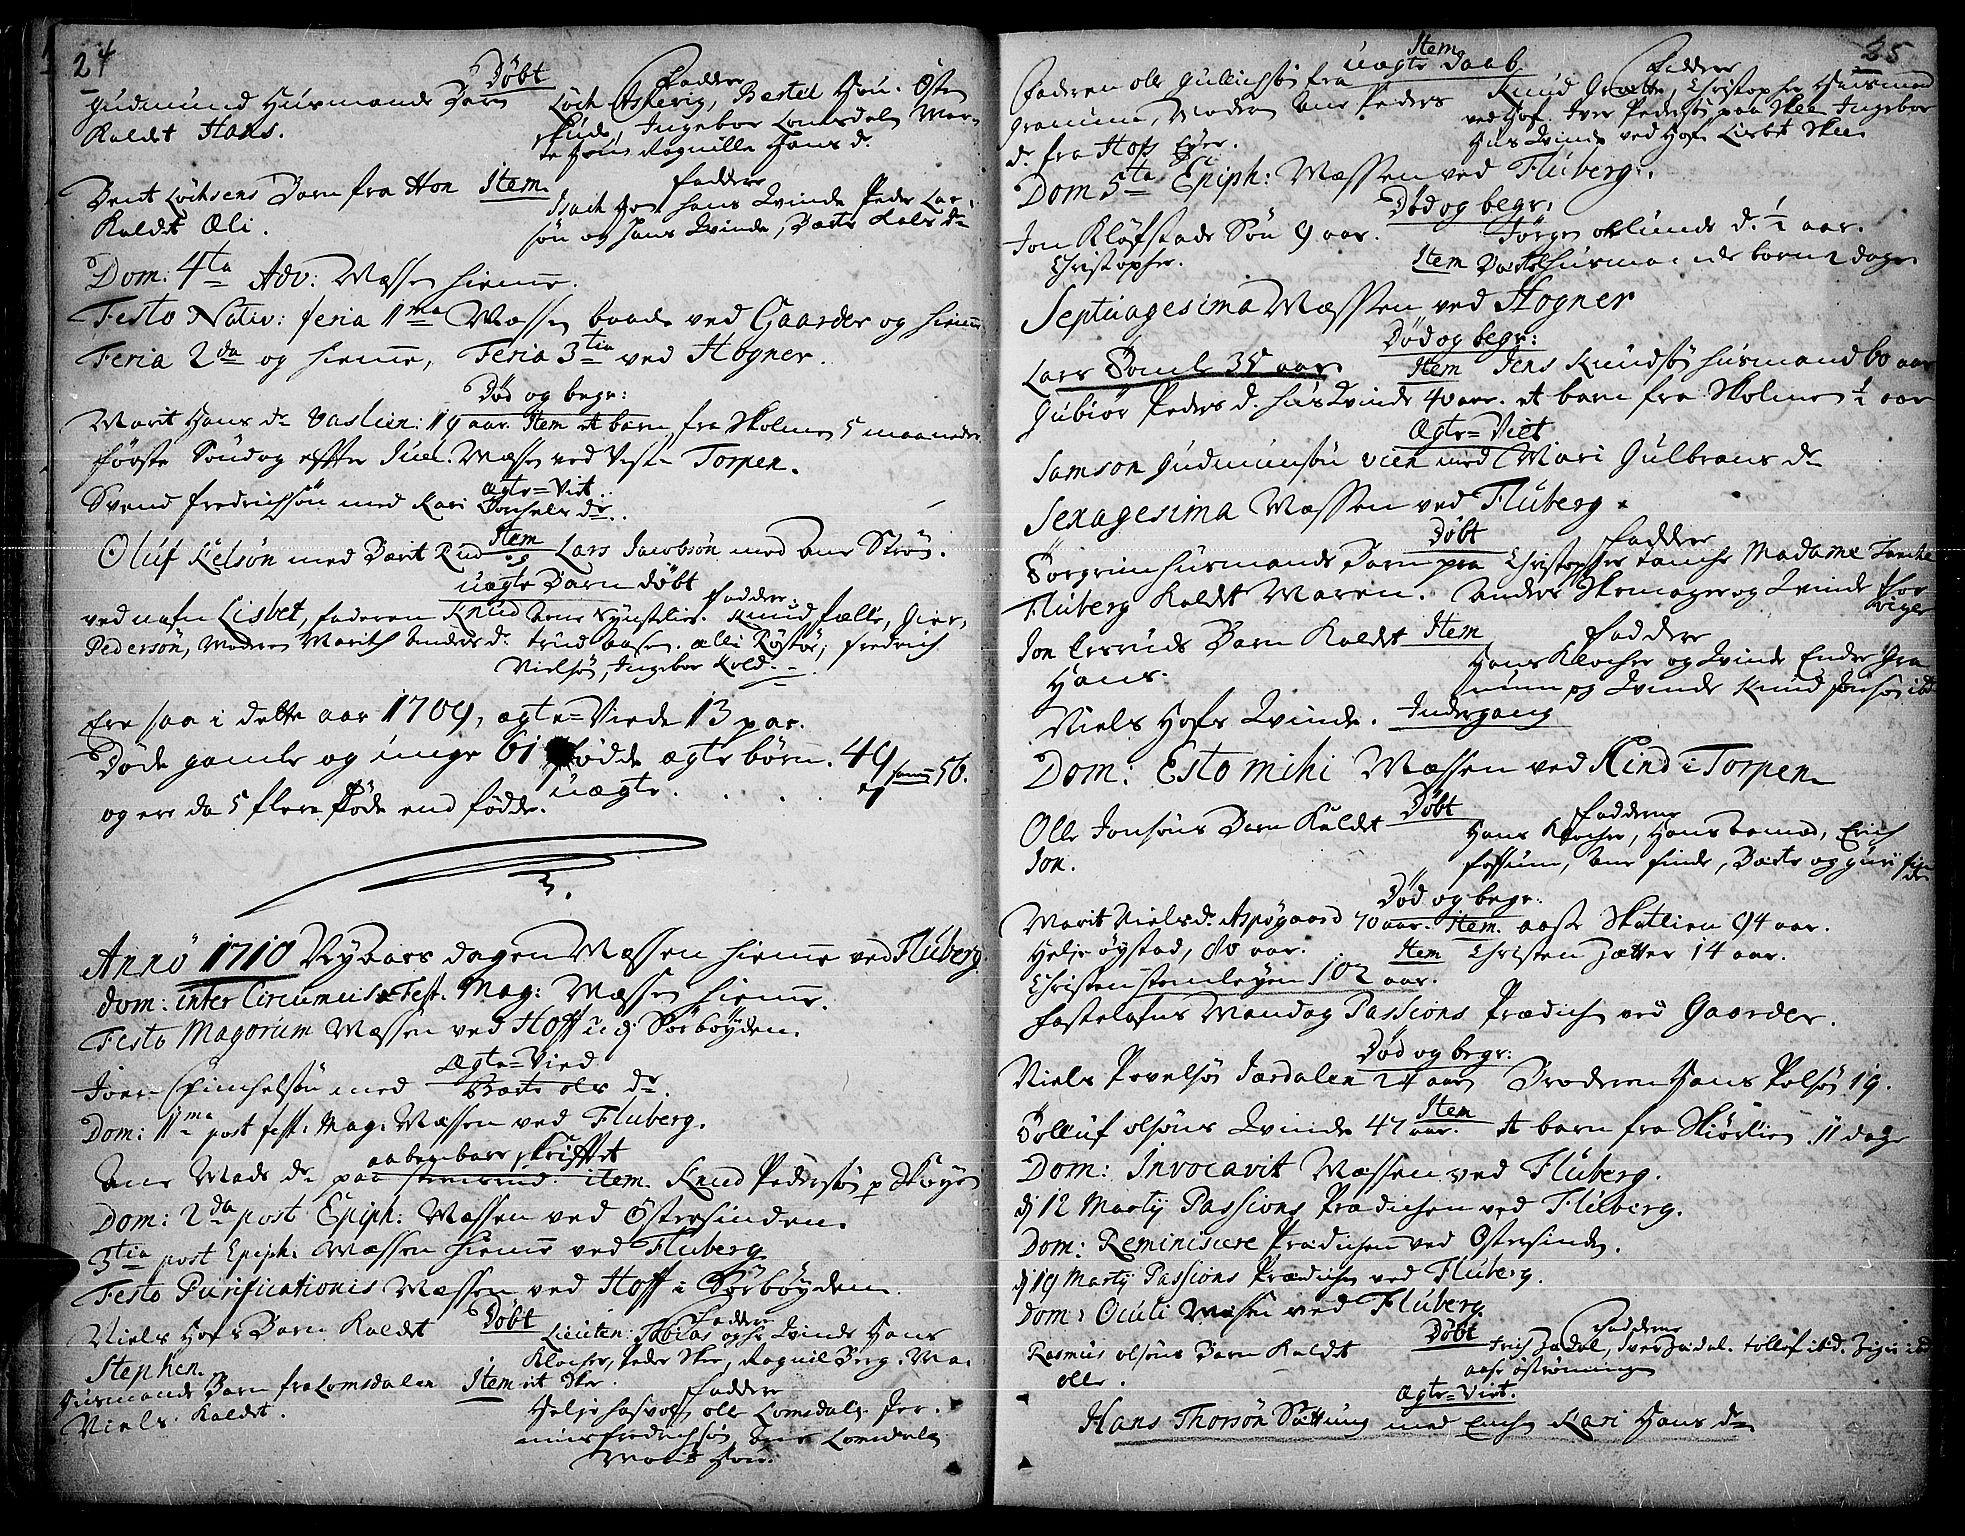 SAH, Land prestekontor, Ministerialbok nr. 1, 1708-1732, s. 24-25